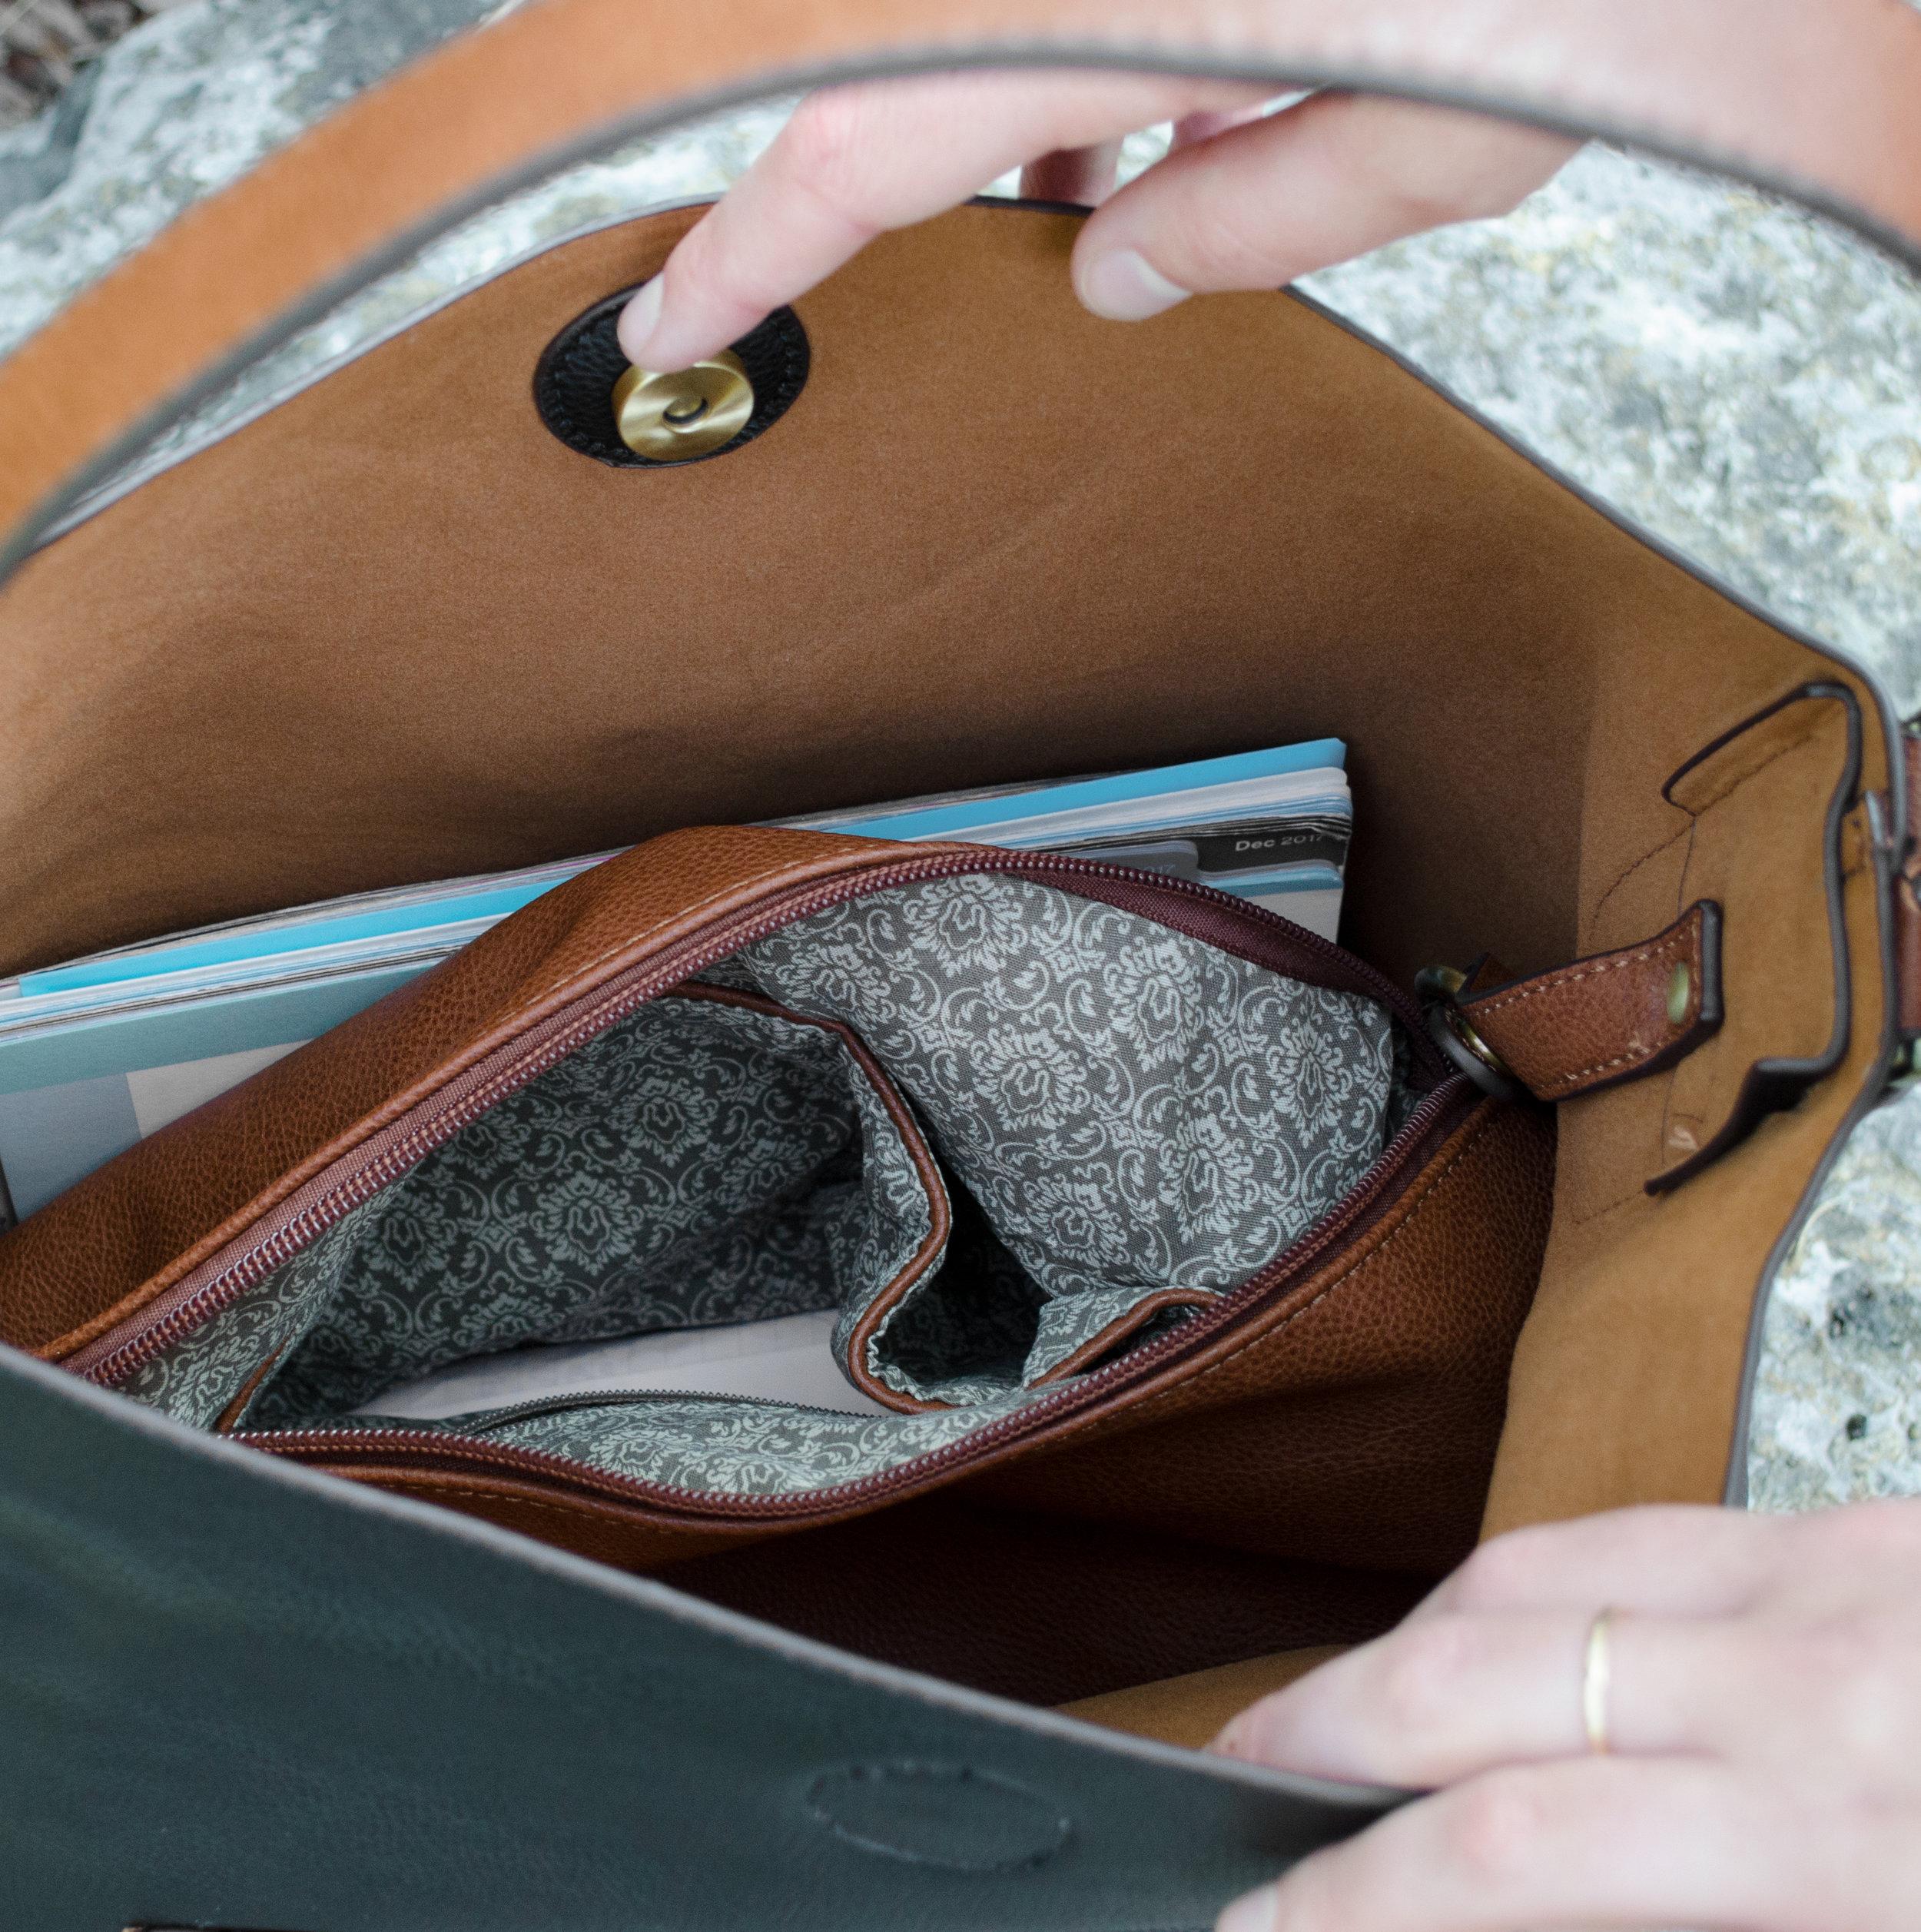 joy-susan-purse-inside.jpg